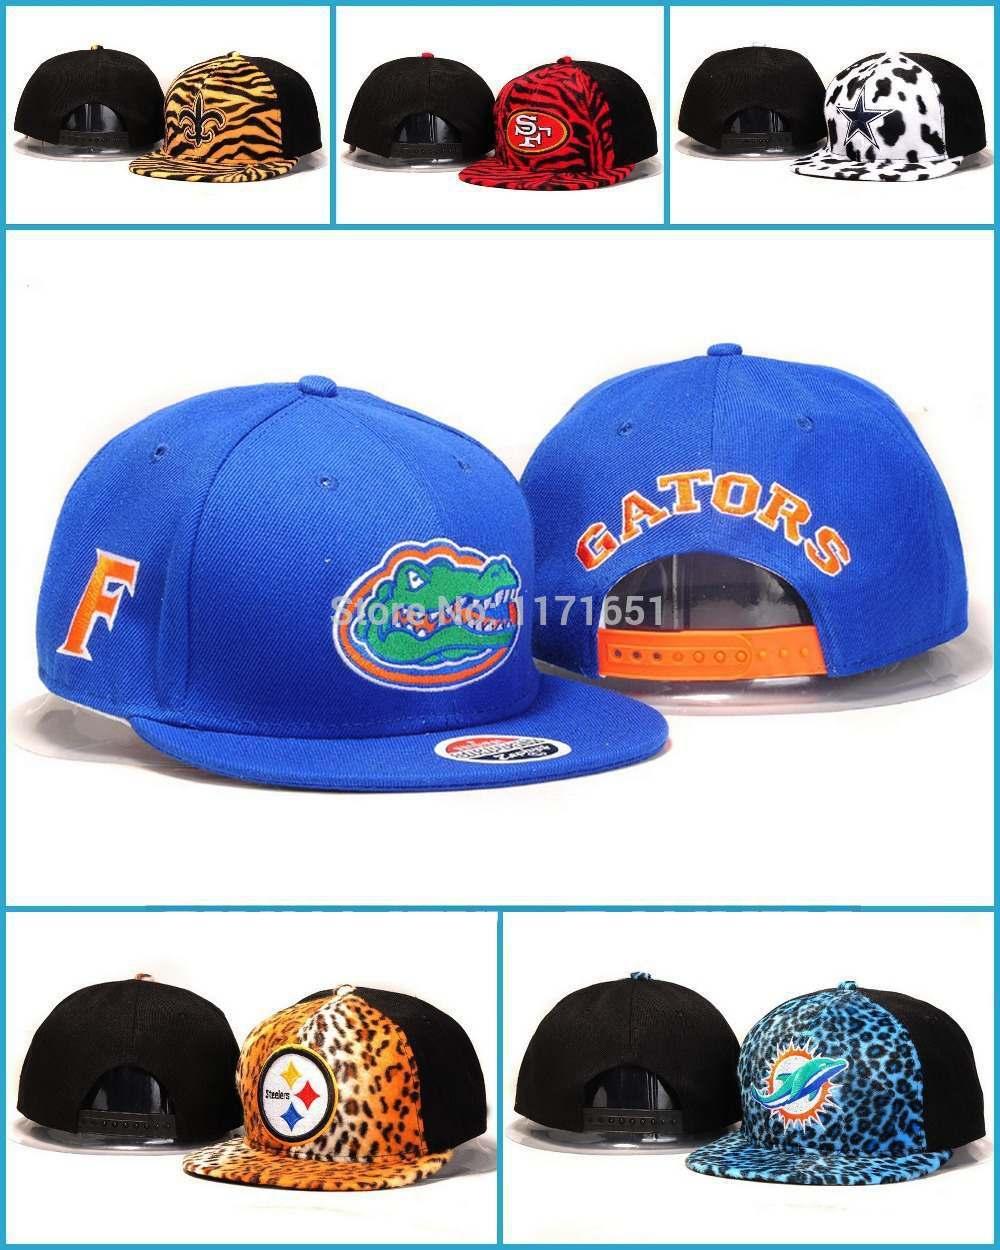 Free shipping! Newest models,Hot selling National Football League Snapback hats,Sport hat,baseball snapback caps 10pcs/lot(China (Mainland))